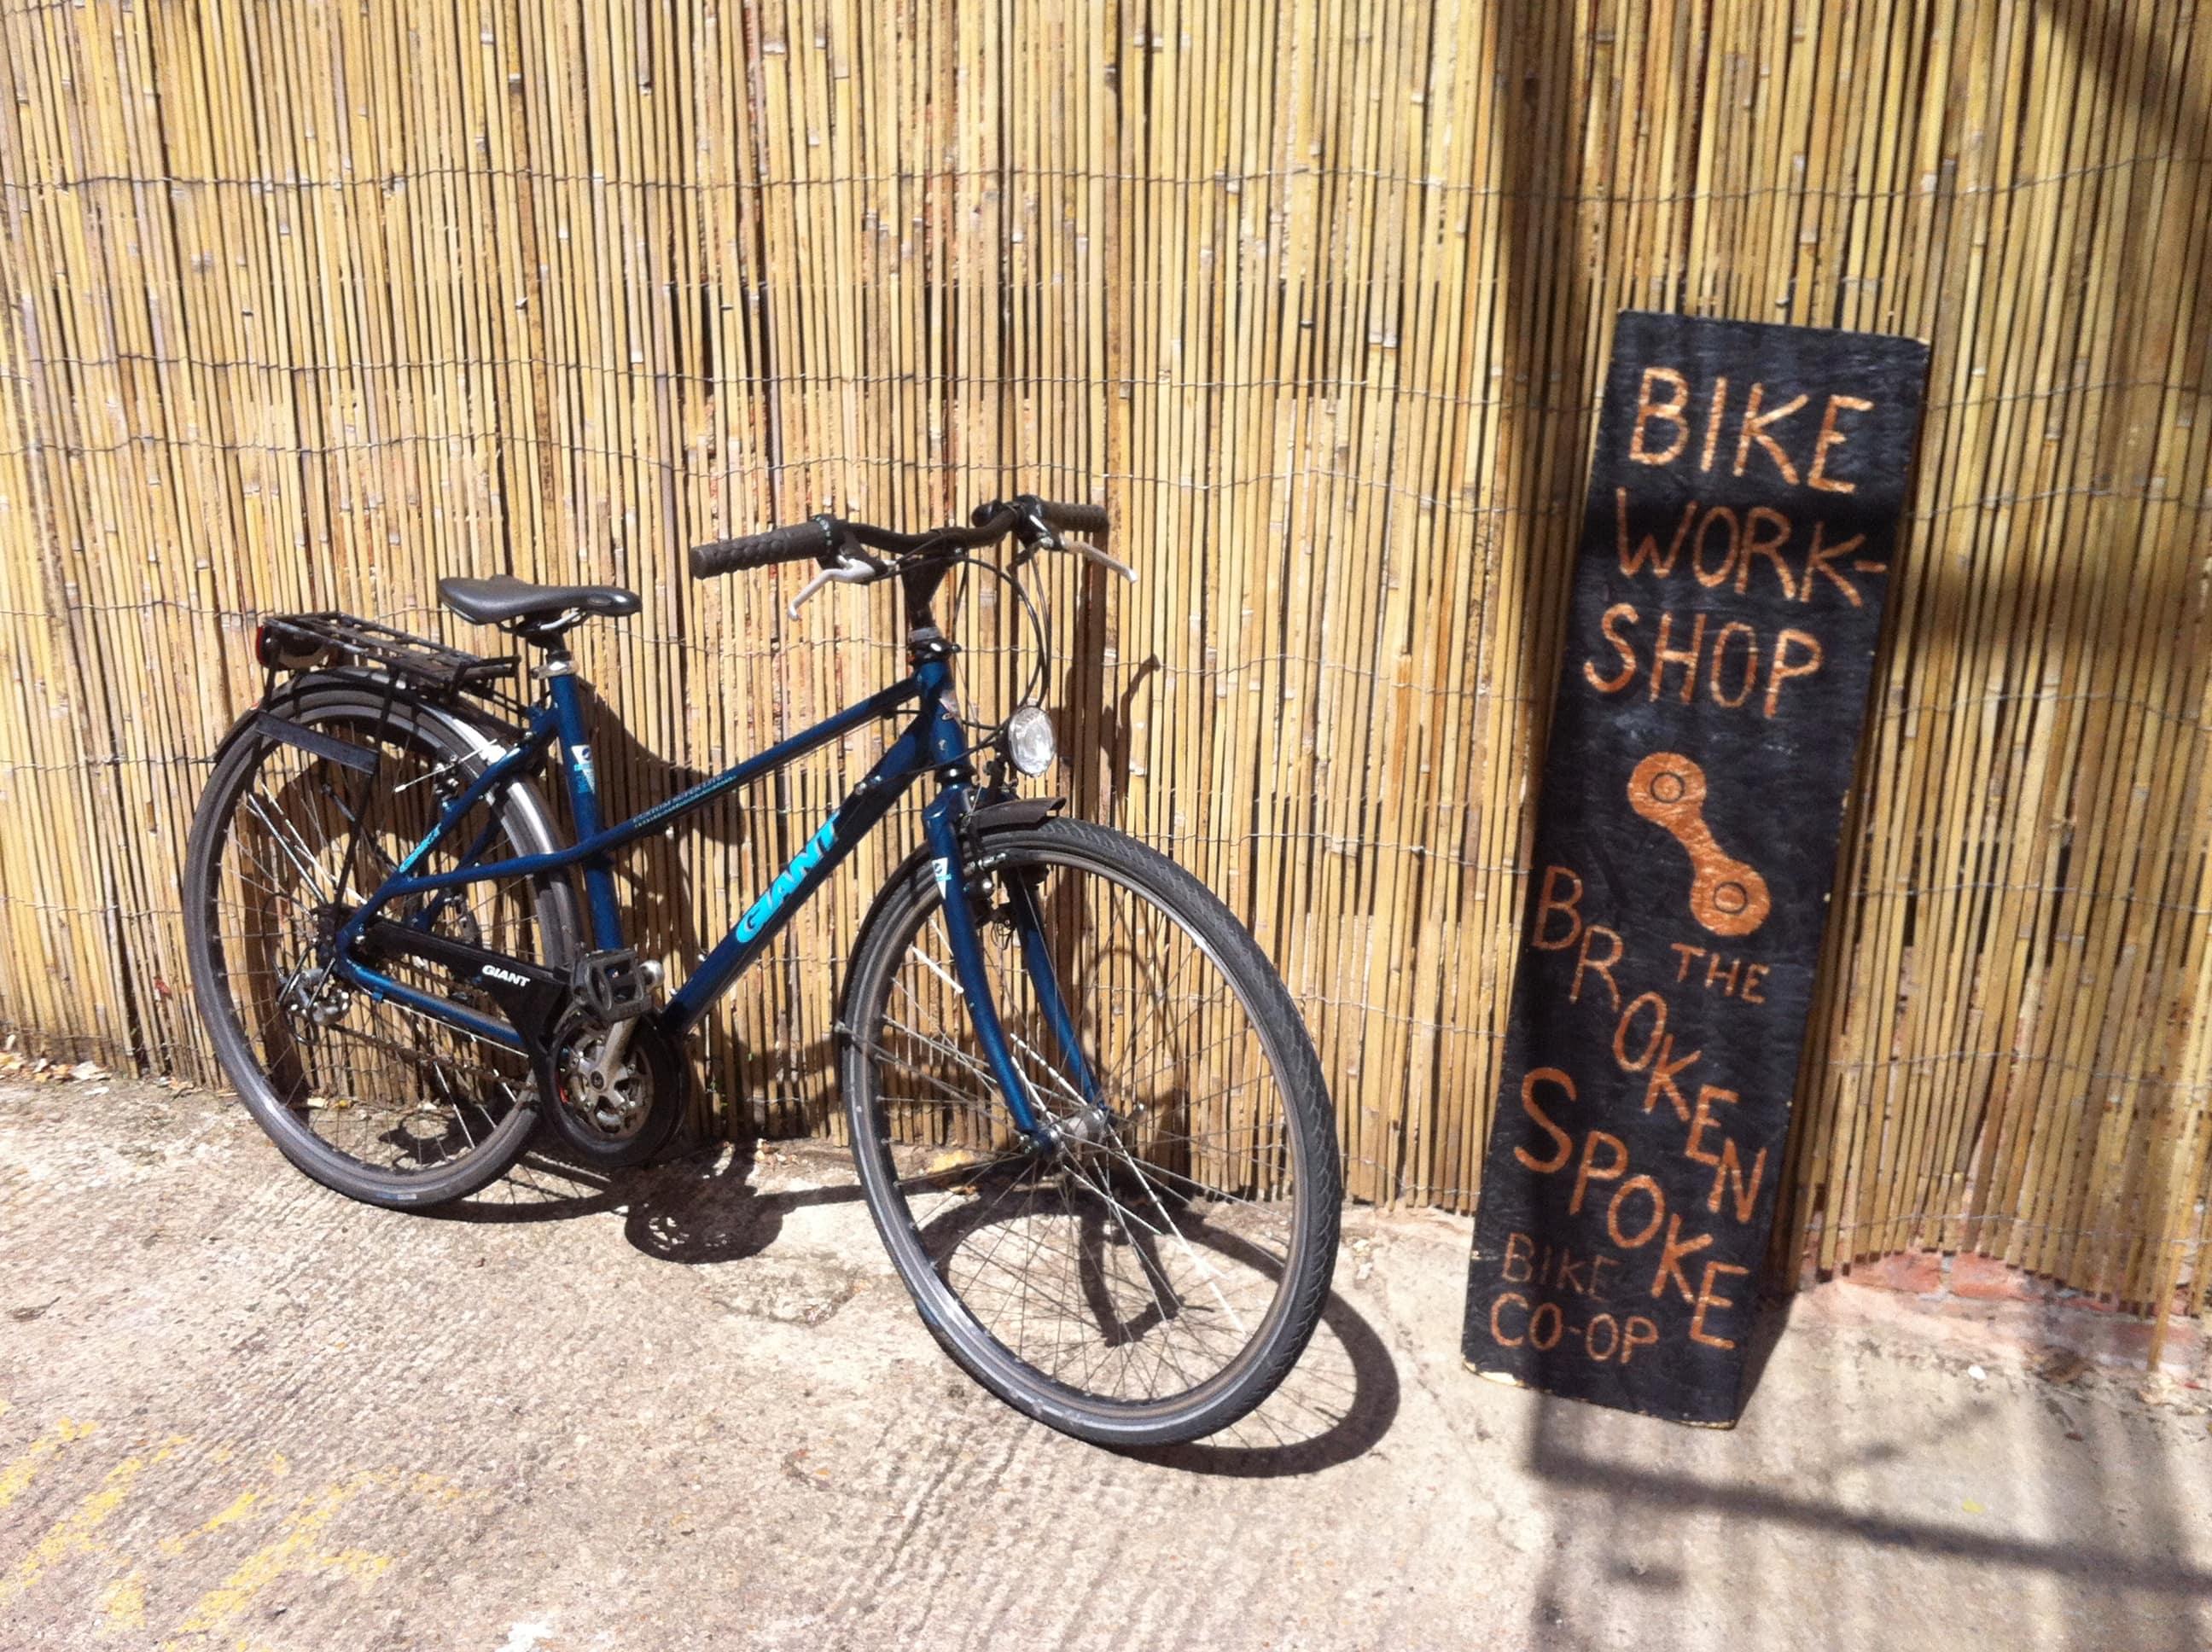 Giant Custom Super Lite, 50cm, mixte town-bike with dynamo lights + rack + mudguards + sidestand